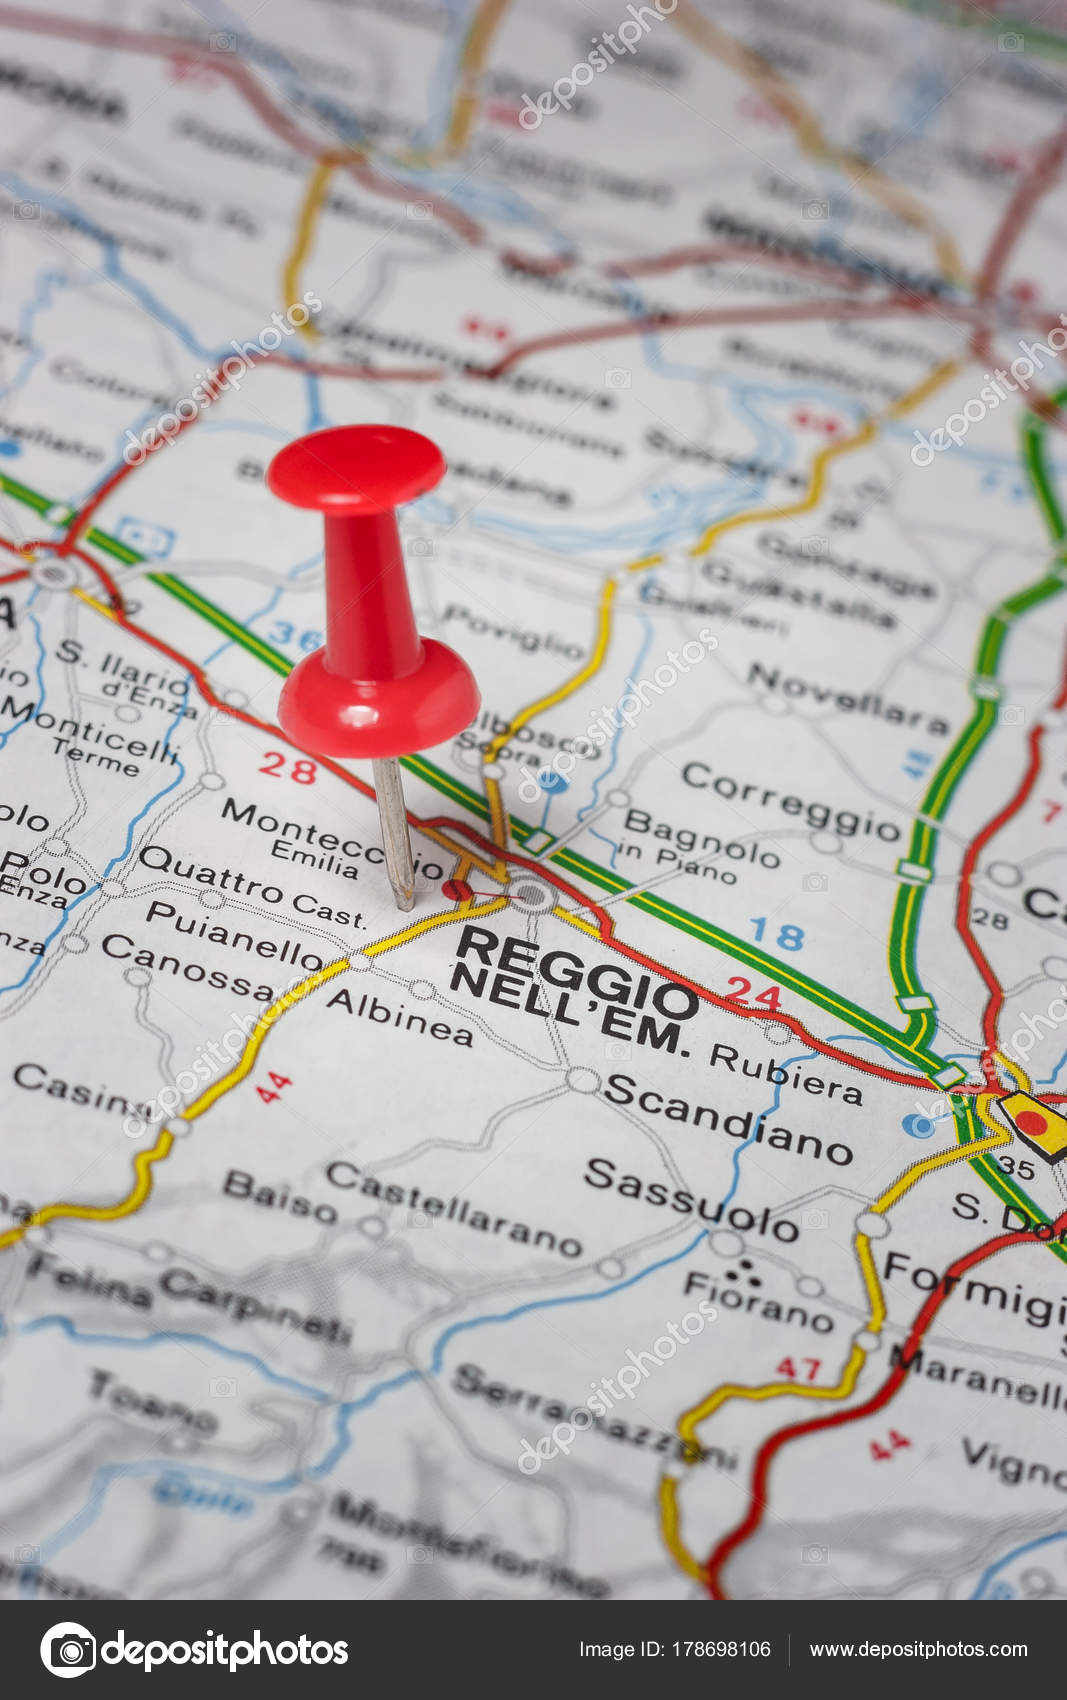 Reggio Emilia Pinned On A Map Of Italy Stock Photo C Maior 178698106